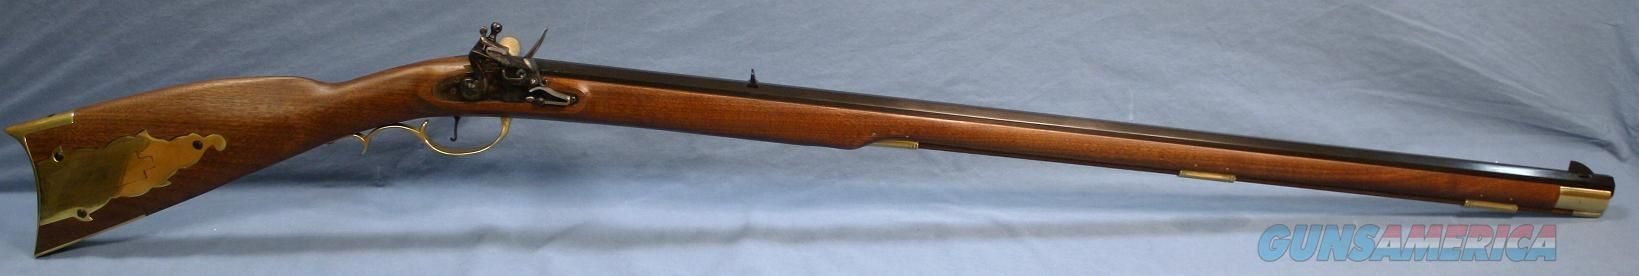 Pedersoli Kentucky flintlock rifle   old school guns